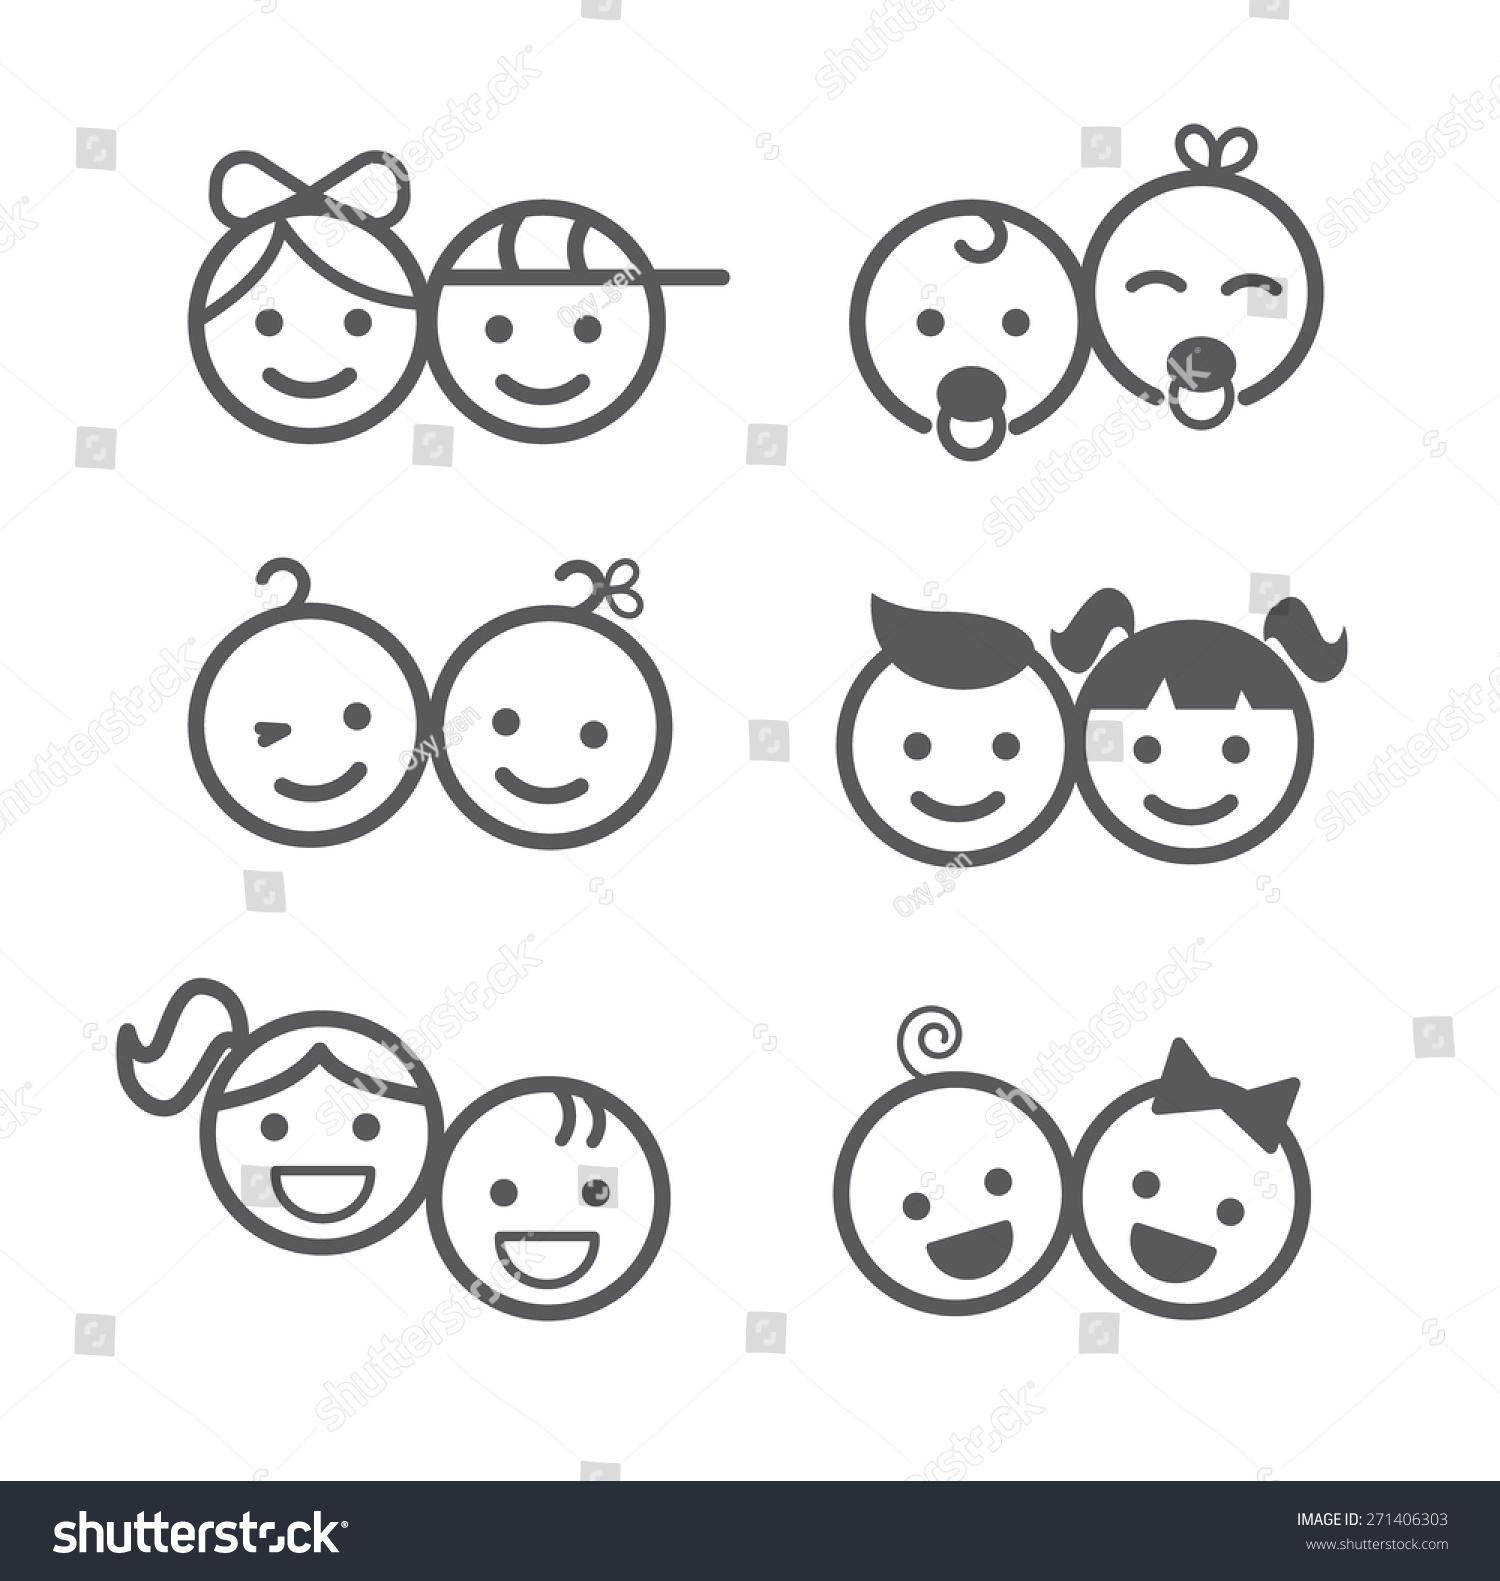 Pin Kids-icon-sets on Pinterest